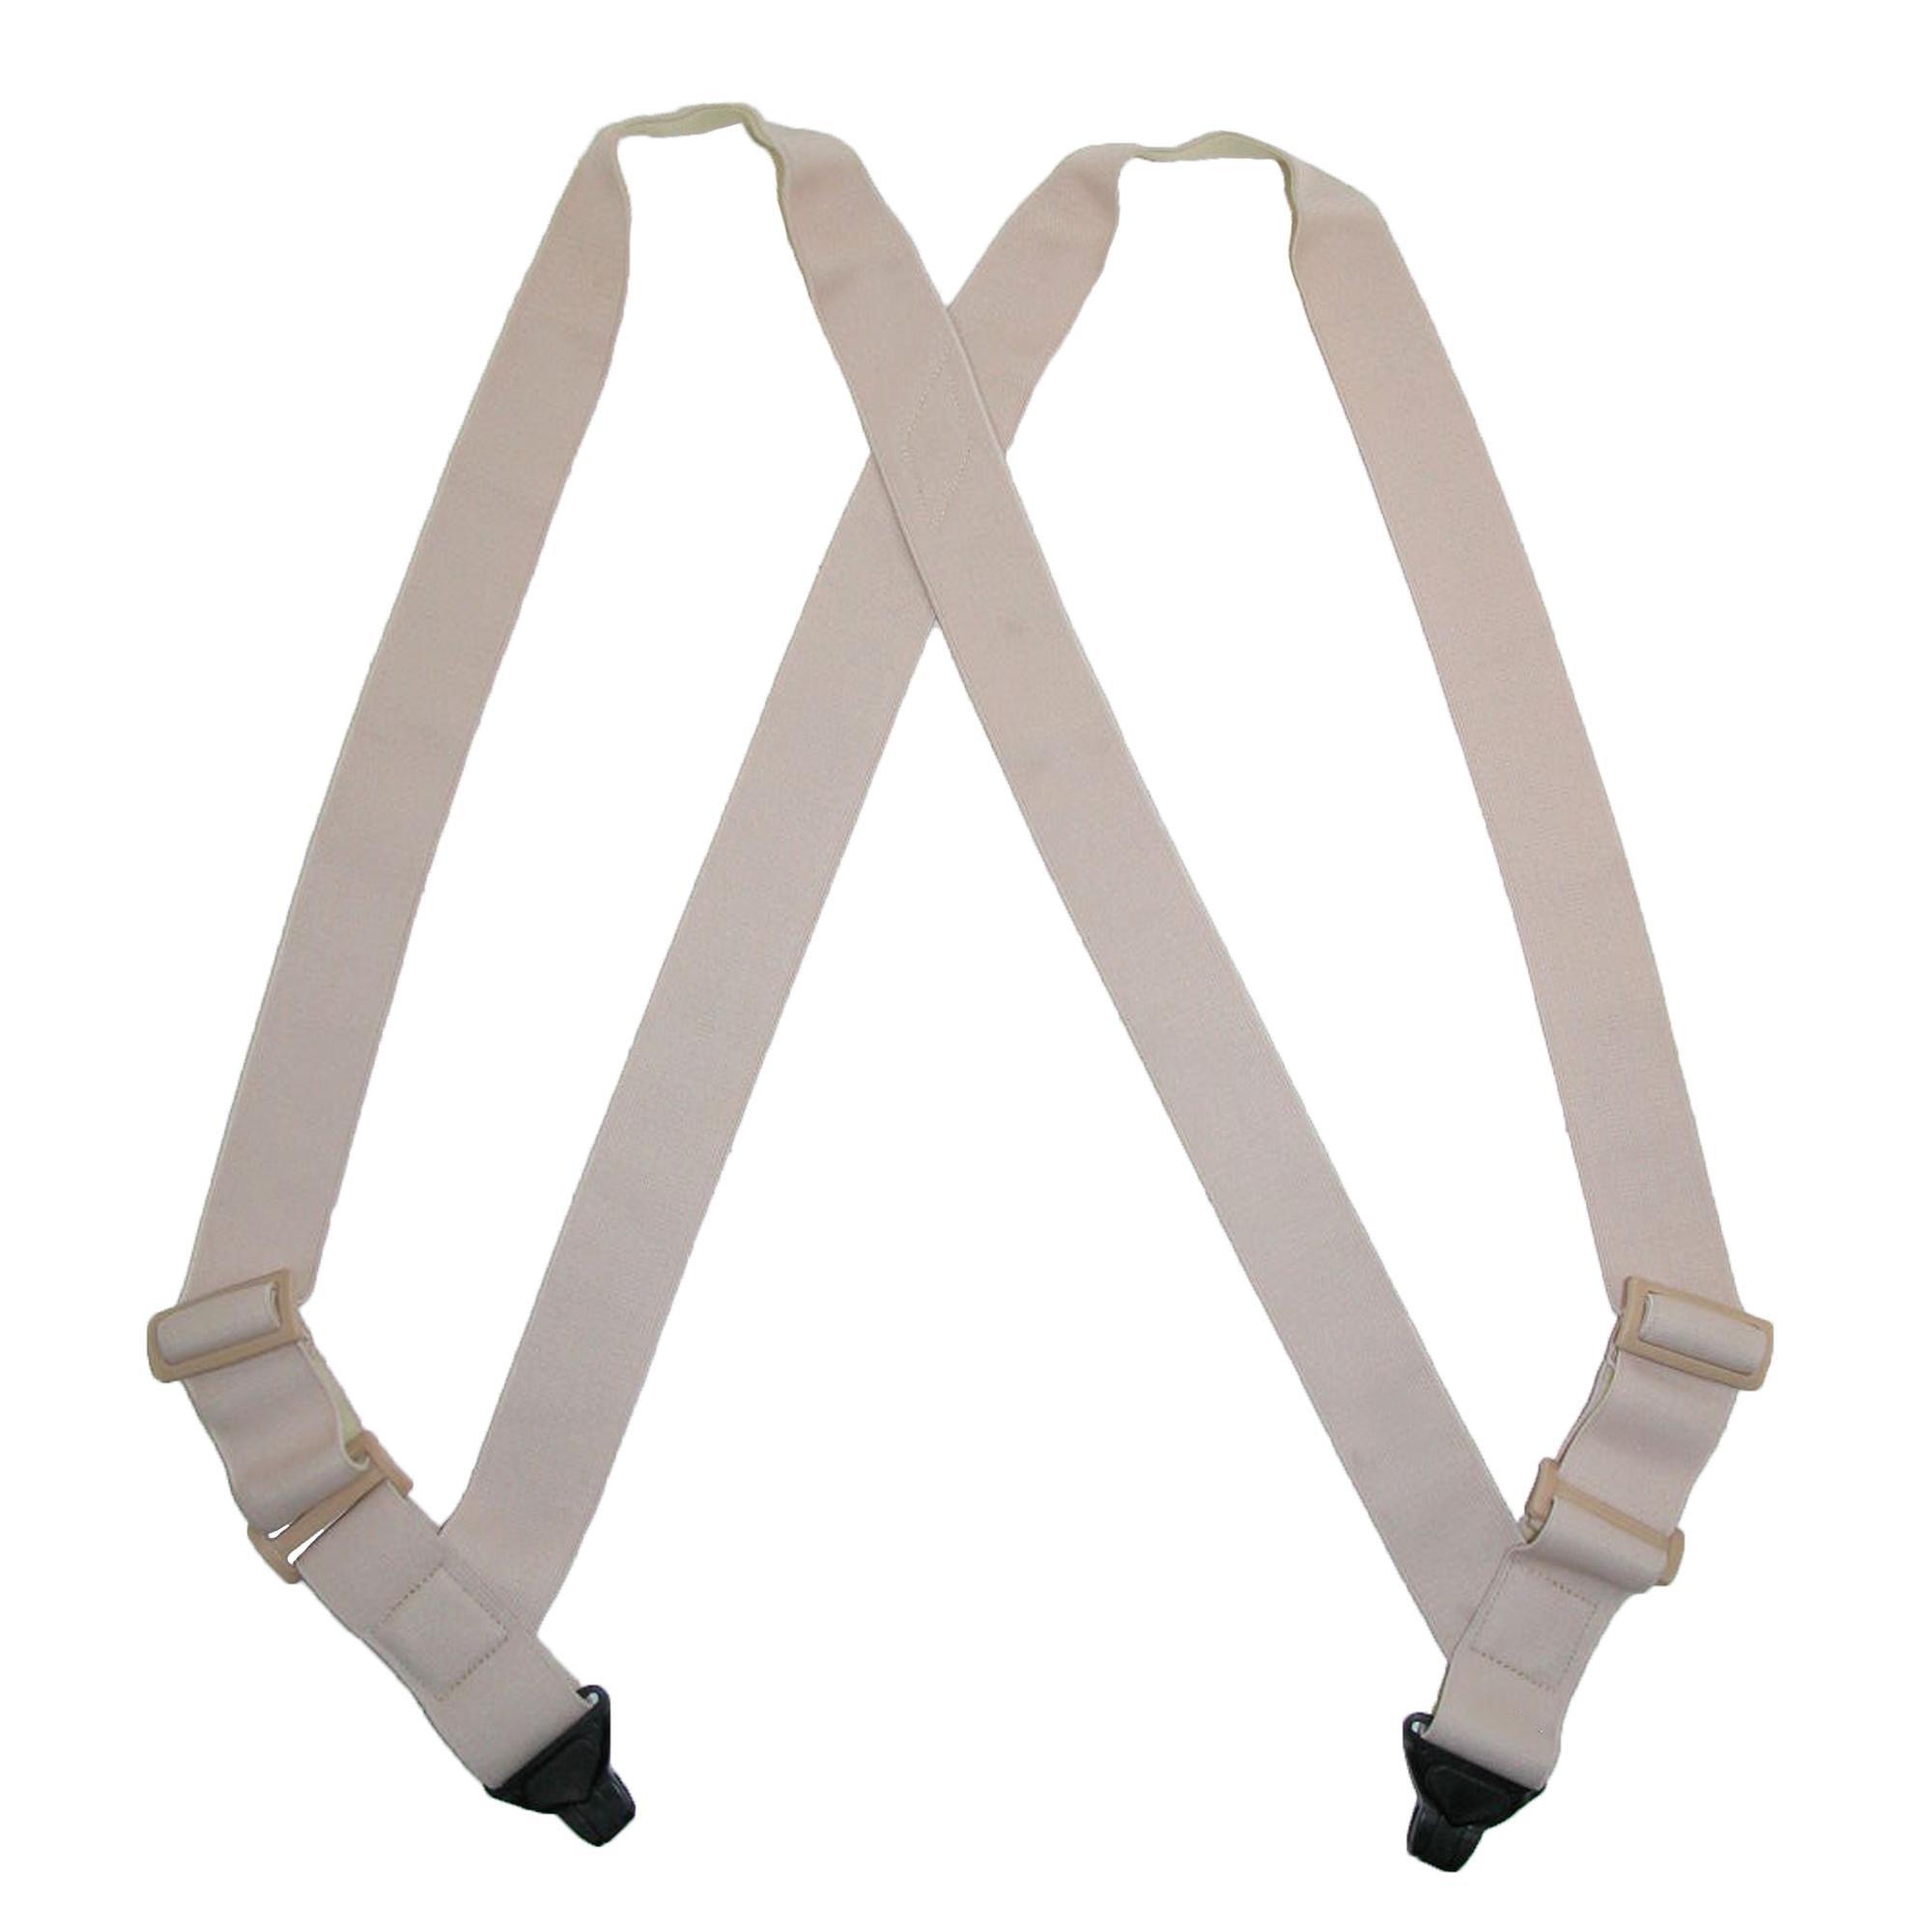 CTM Men's Undergarment TSA Compliant Side Clip Airport Suspenders, Beige